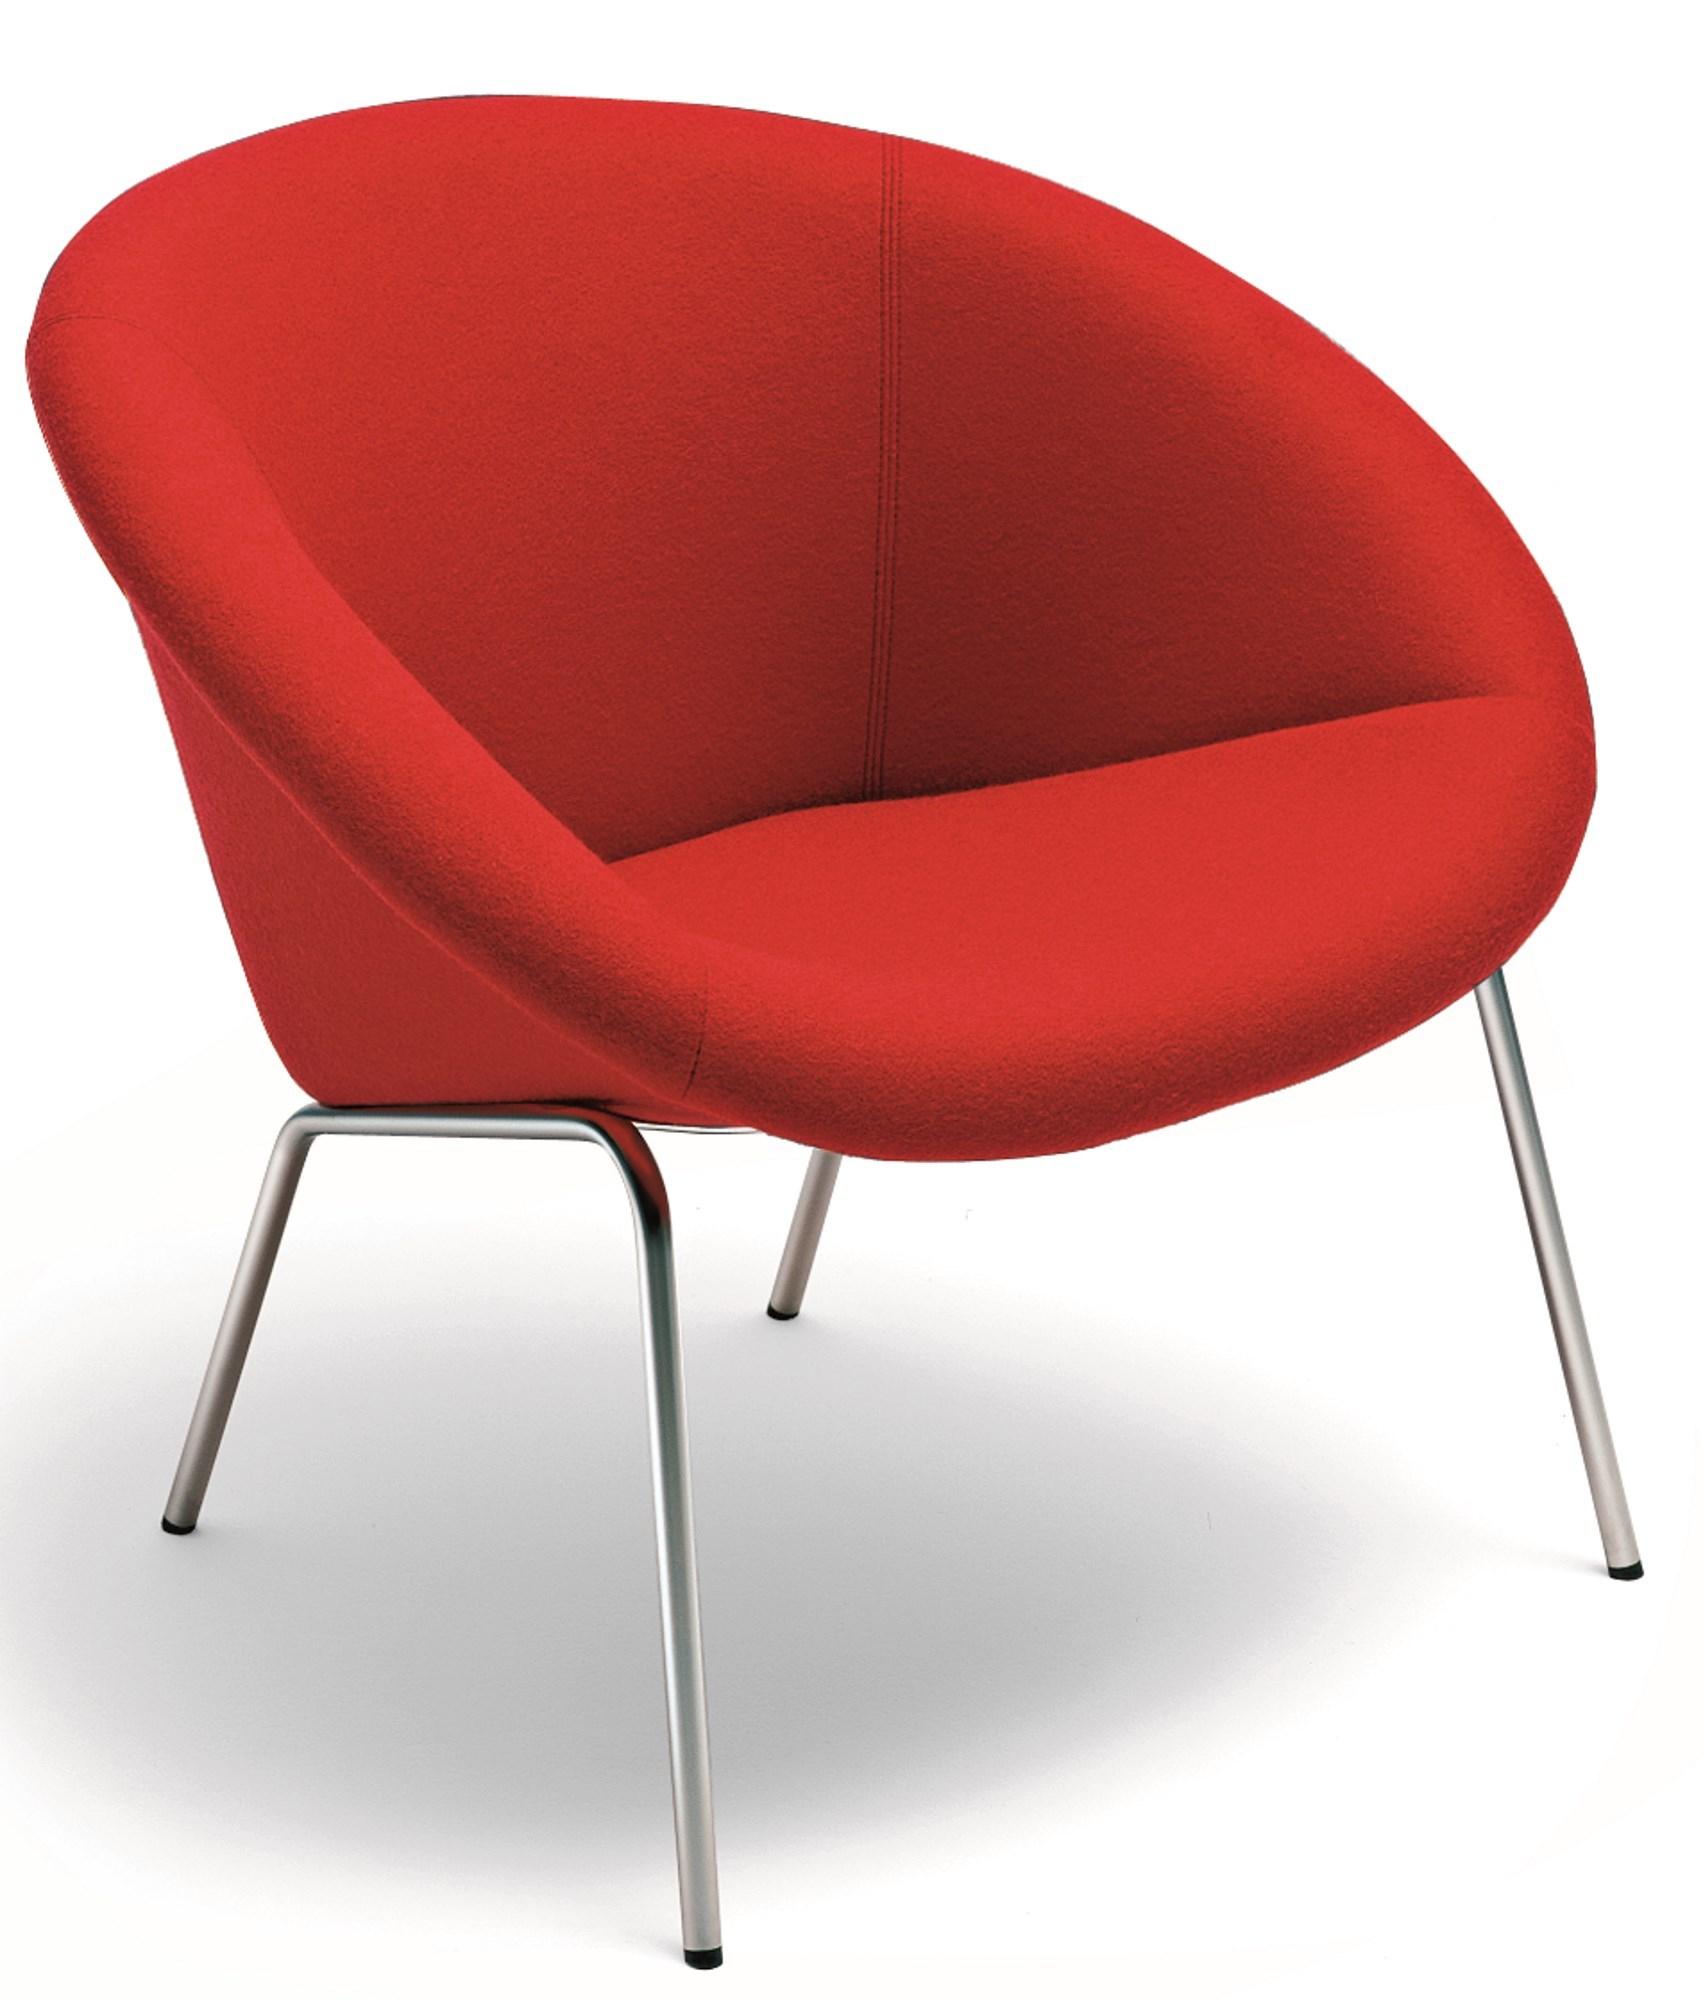 369 Sessel Walter Knoll